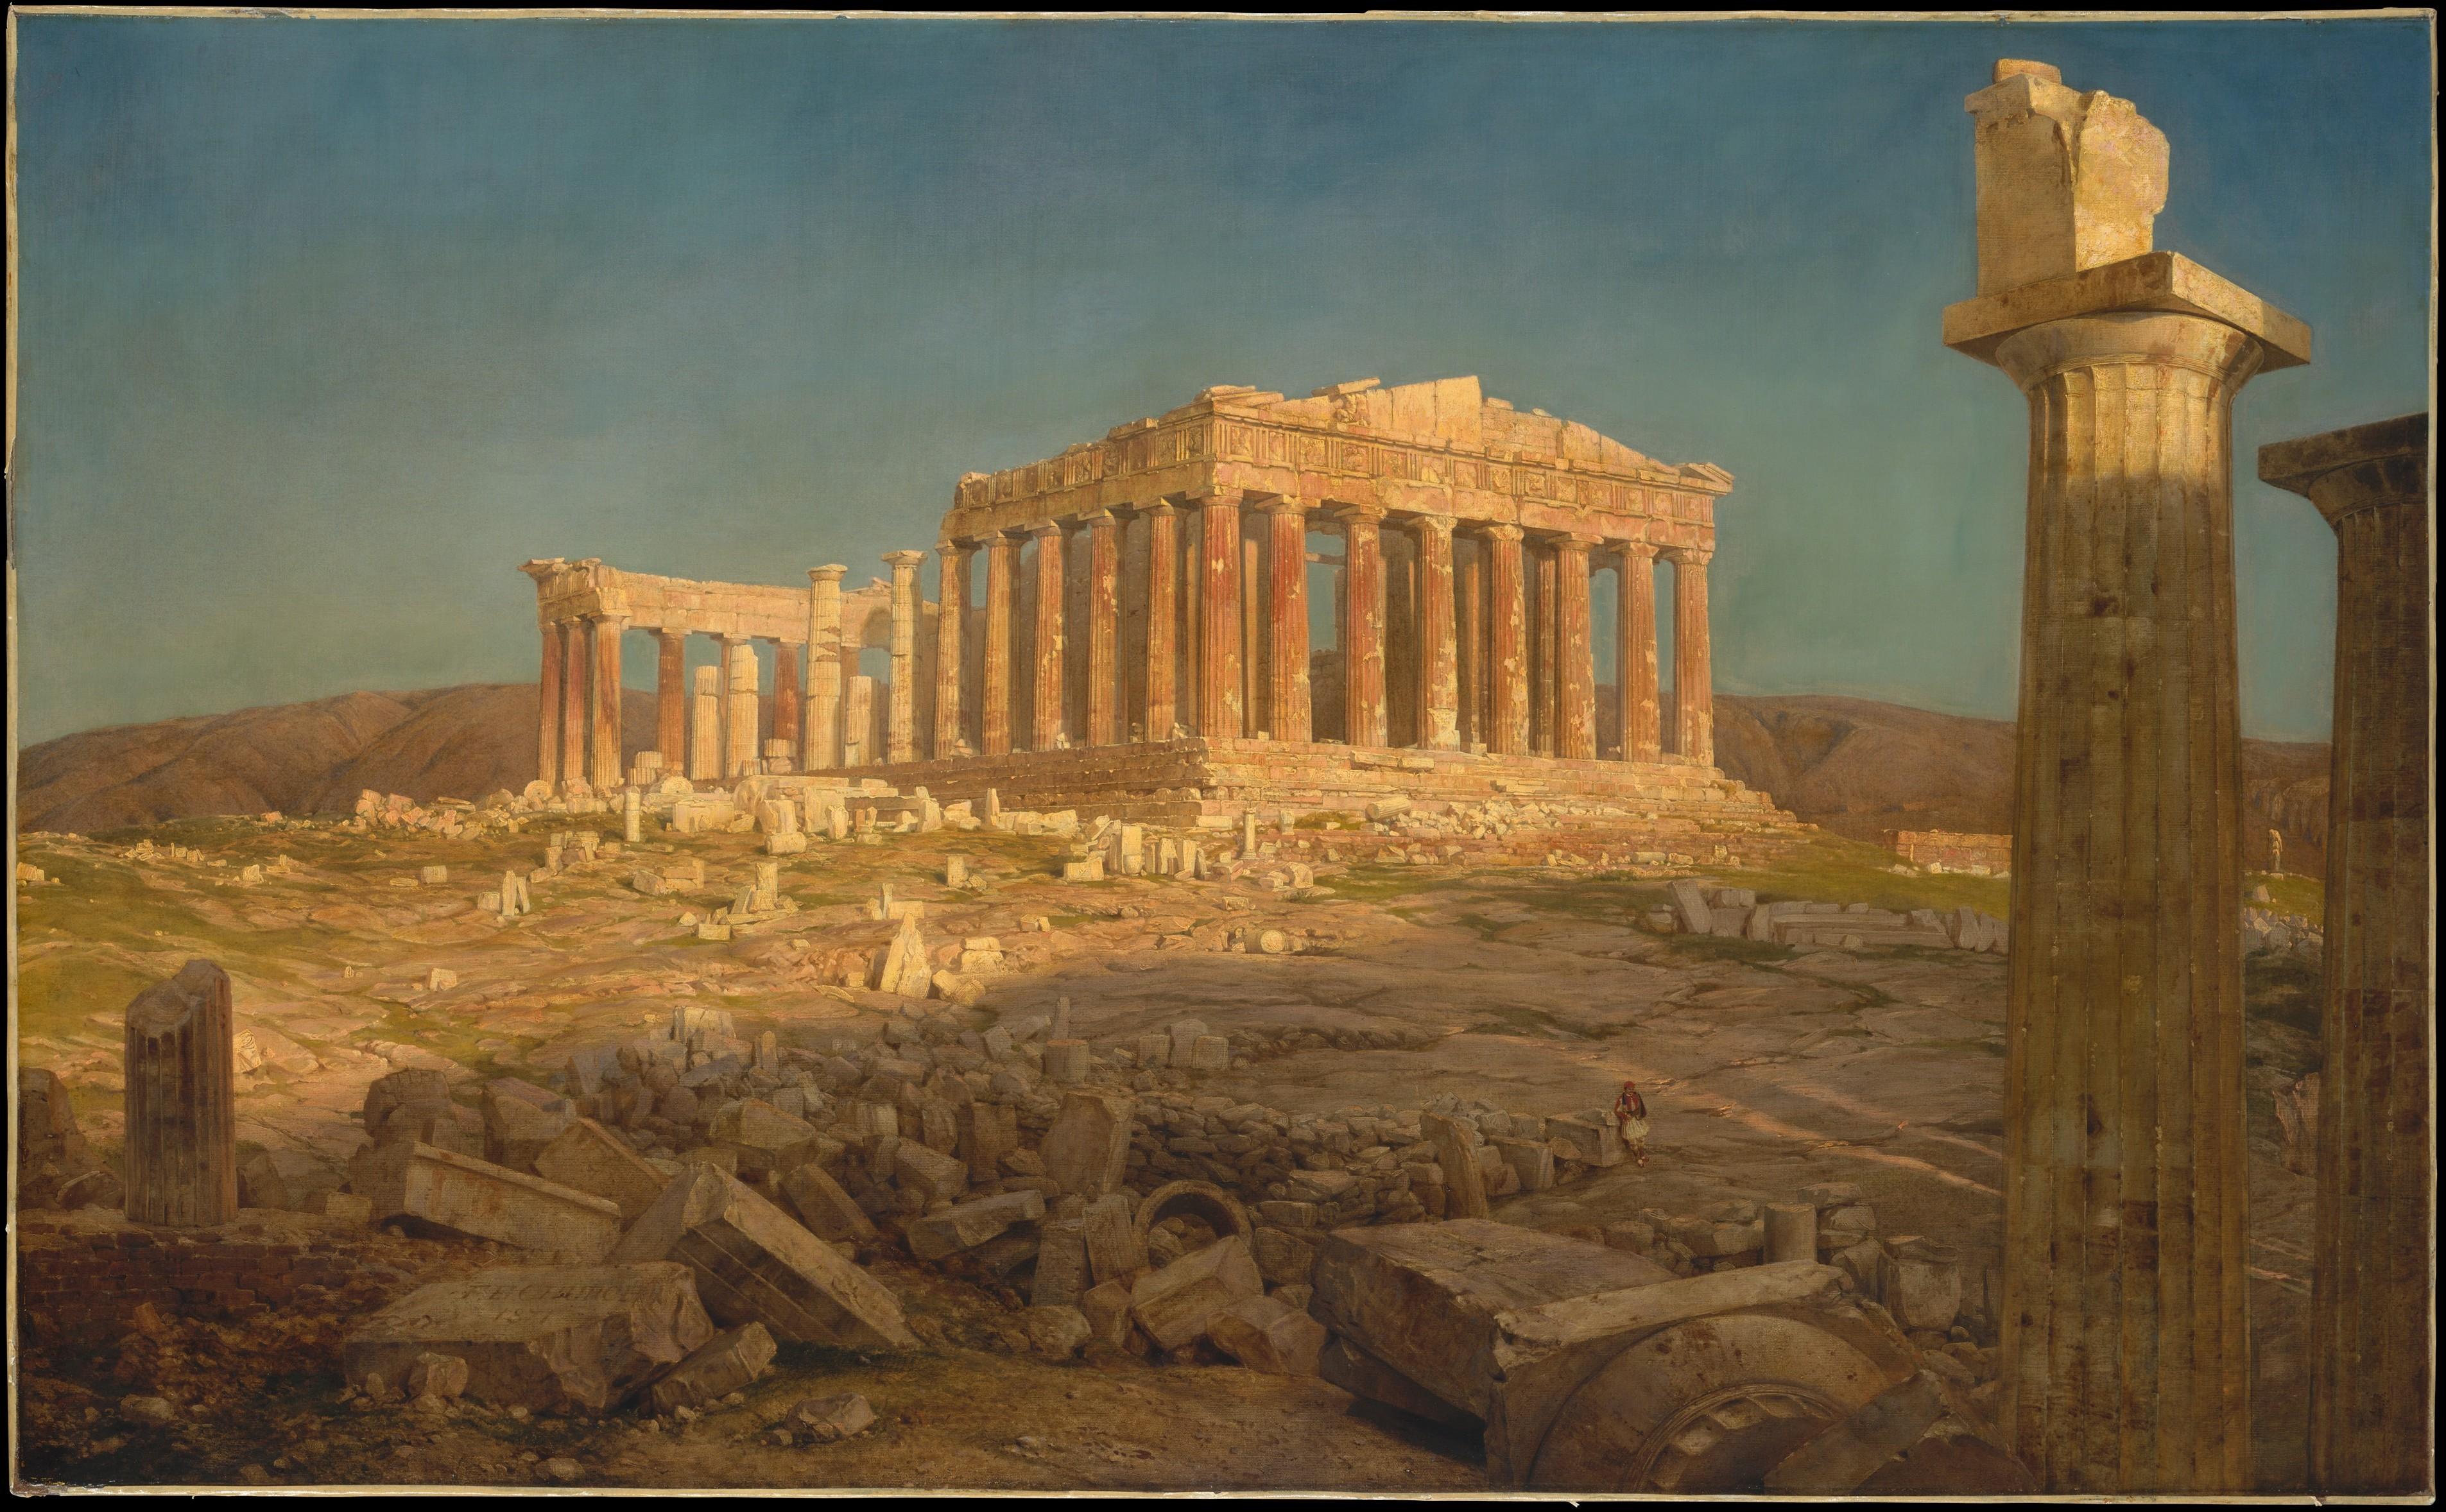 The_Parthenon_MET_DT1540